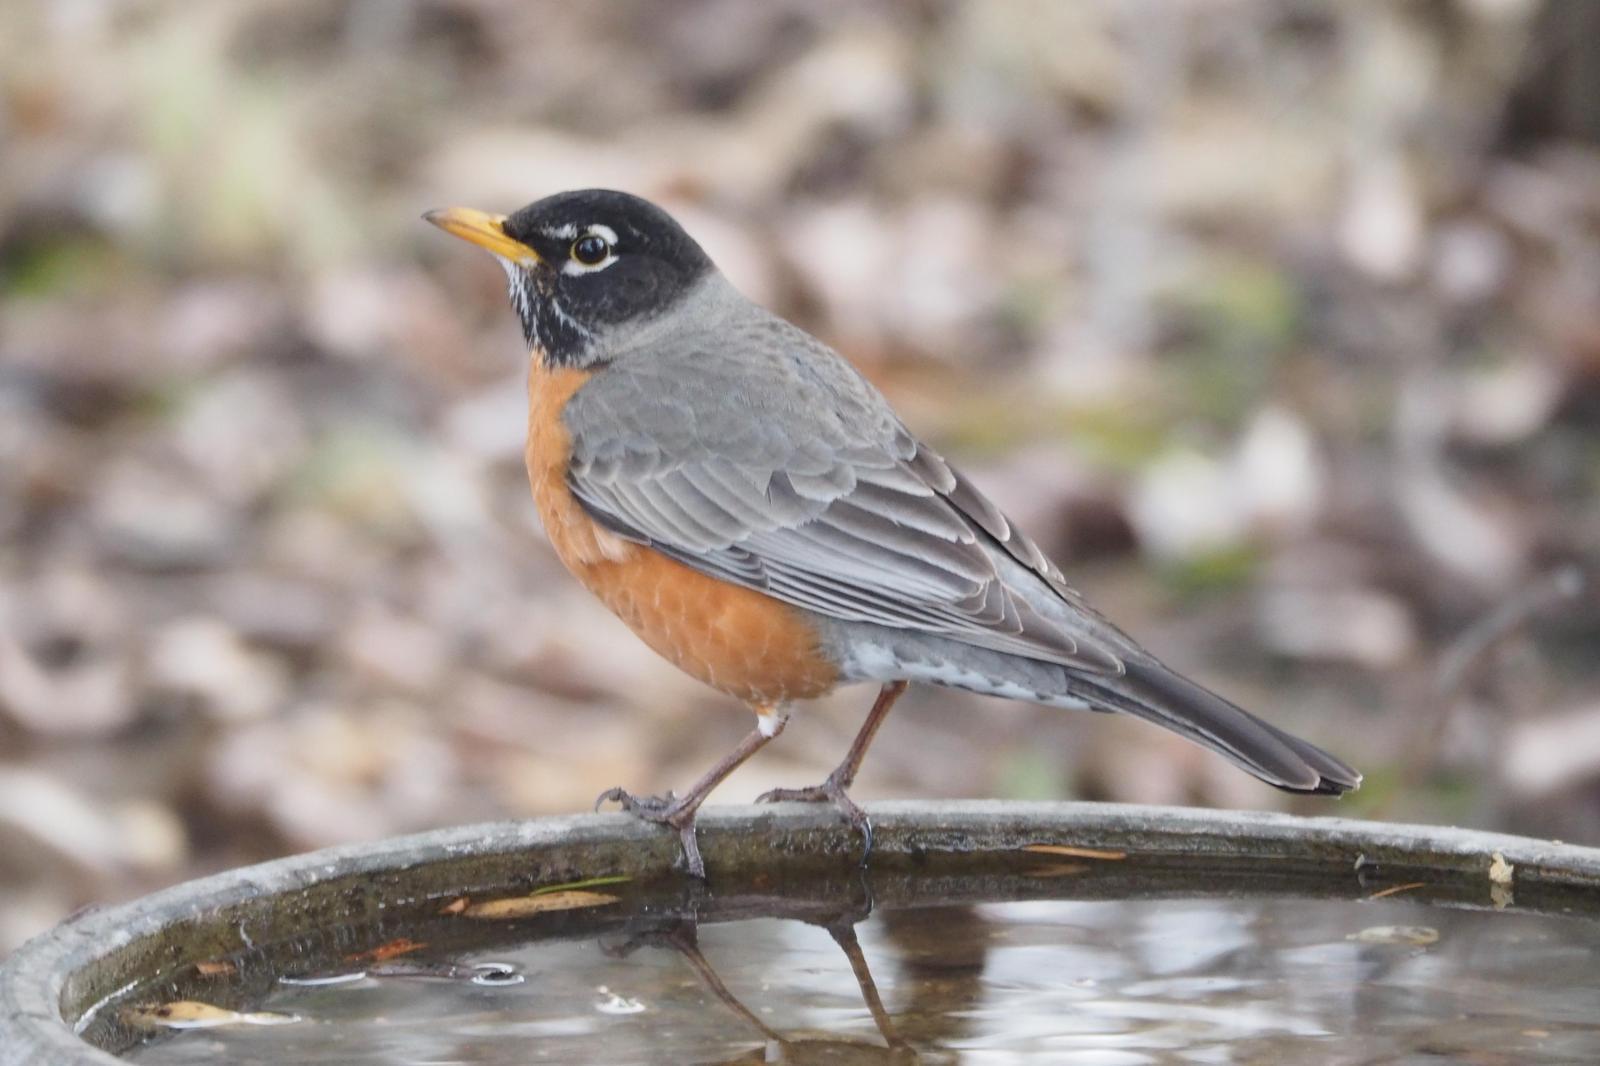 American Robin Photo by Colin Hill